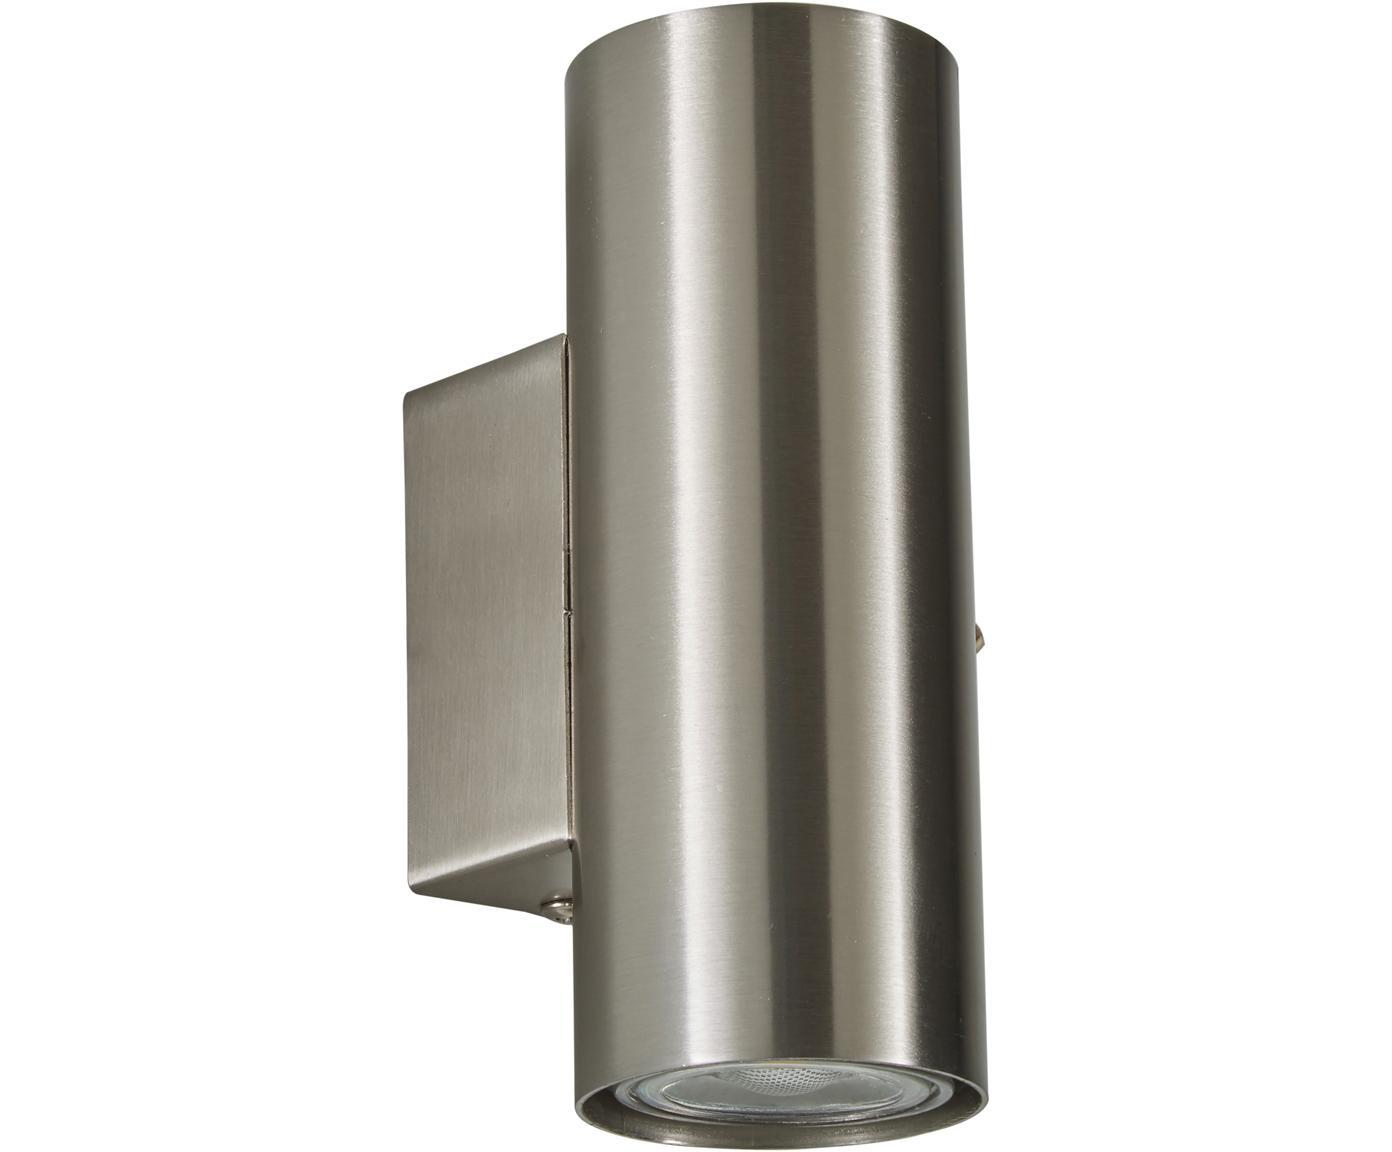 LED Wandleuchte Paul, Metall, verchromt, Chrom, 6 x 9 cm